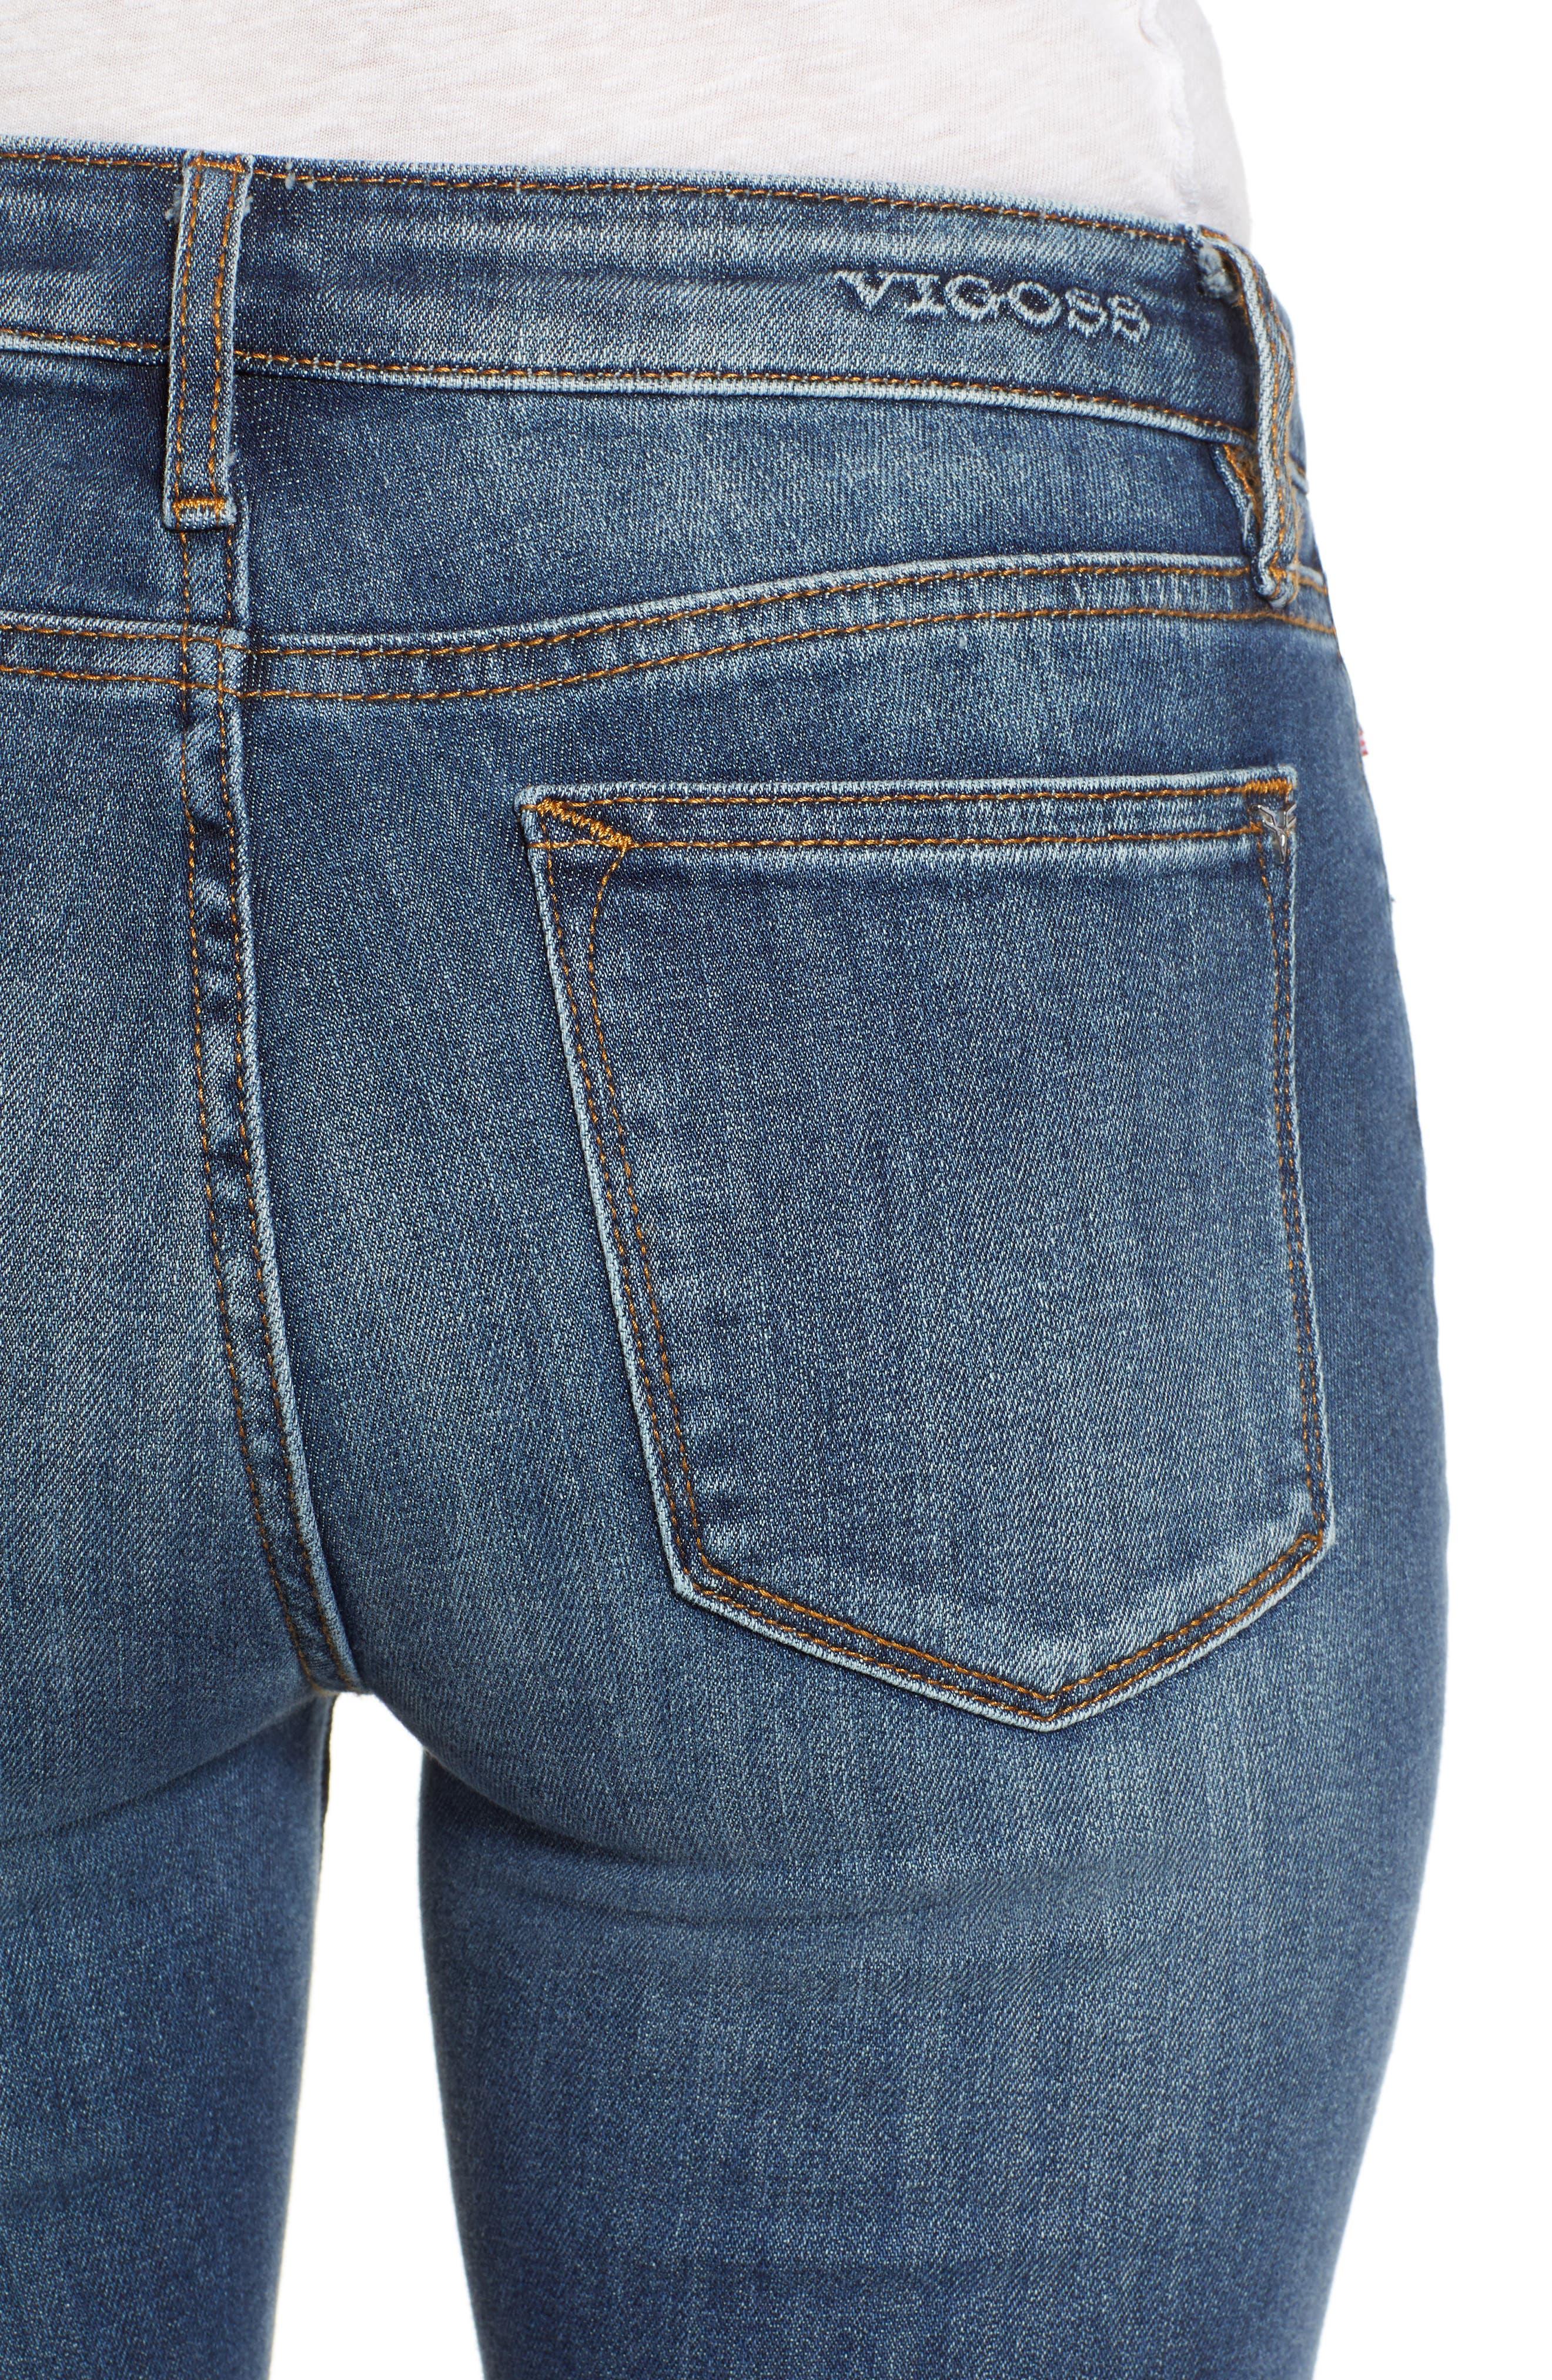 Jagger High Waist Bootcut Jeans,                             Alternate thumbnail 4, color,                             DARK WASH